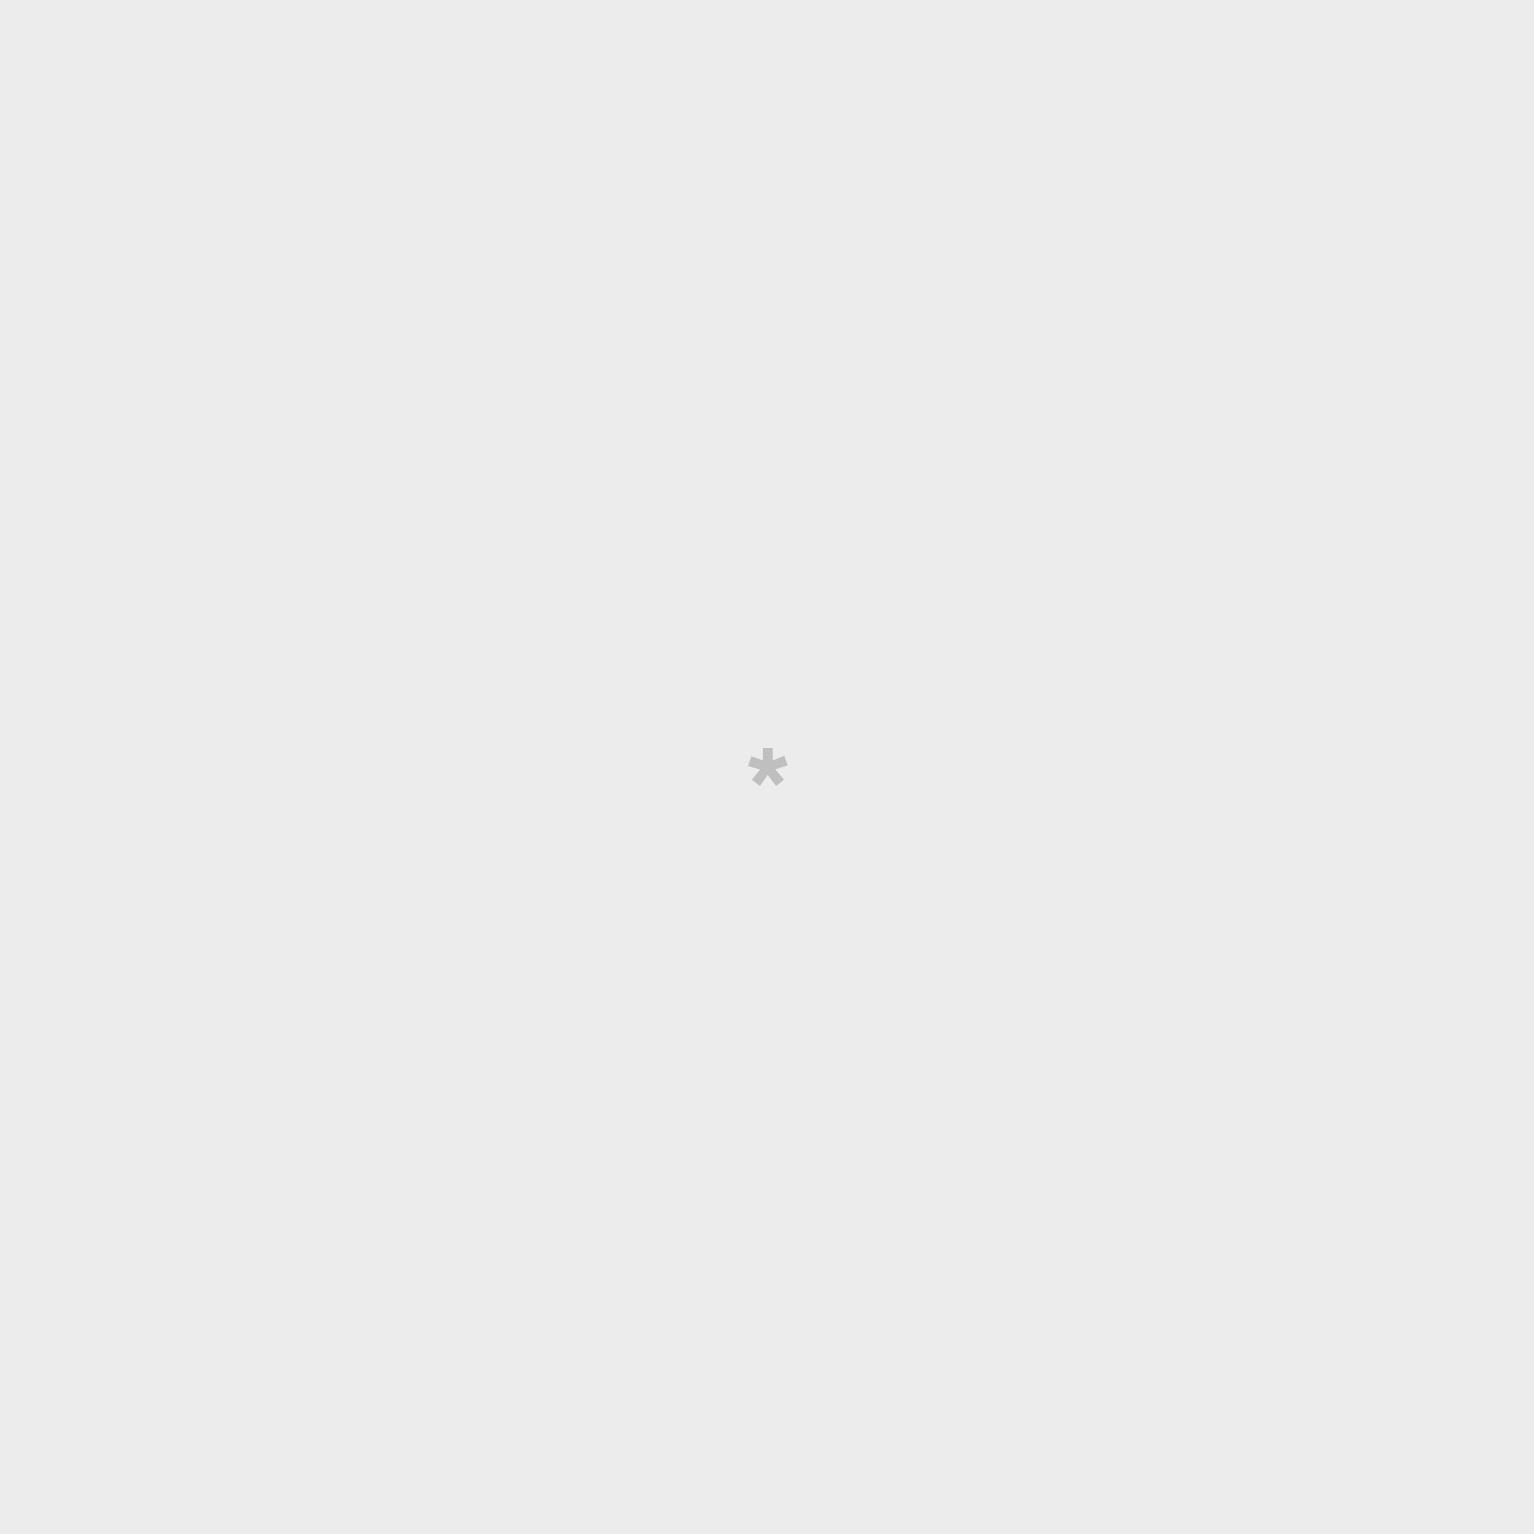 iPhone 12 MR phone case - Cupcake